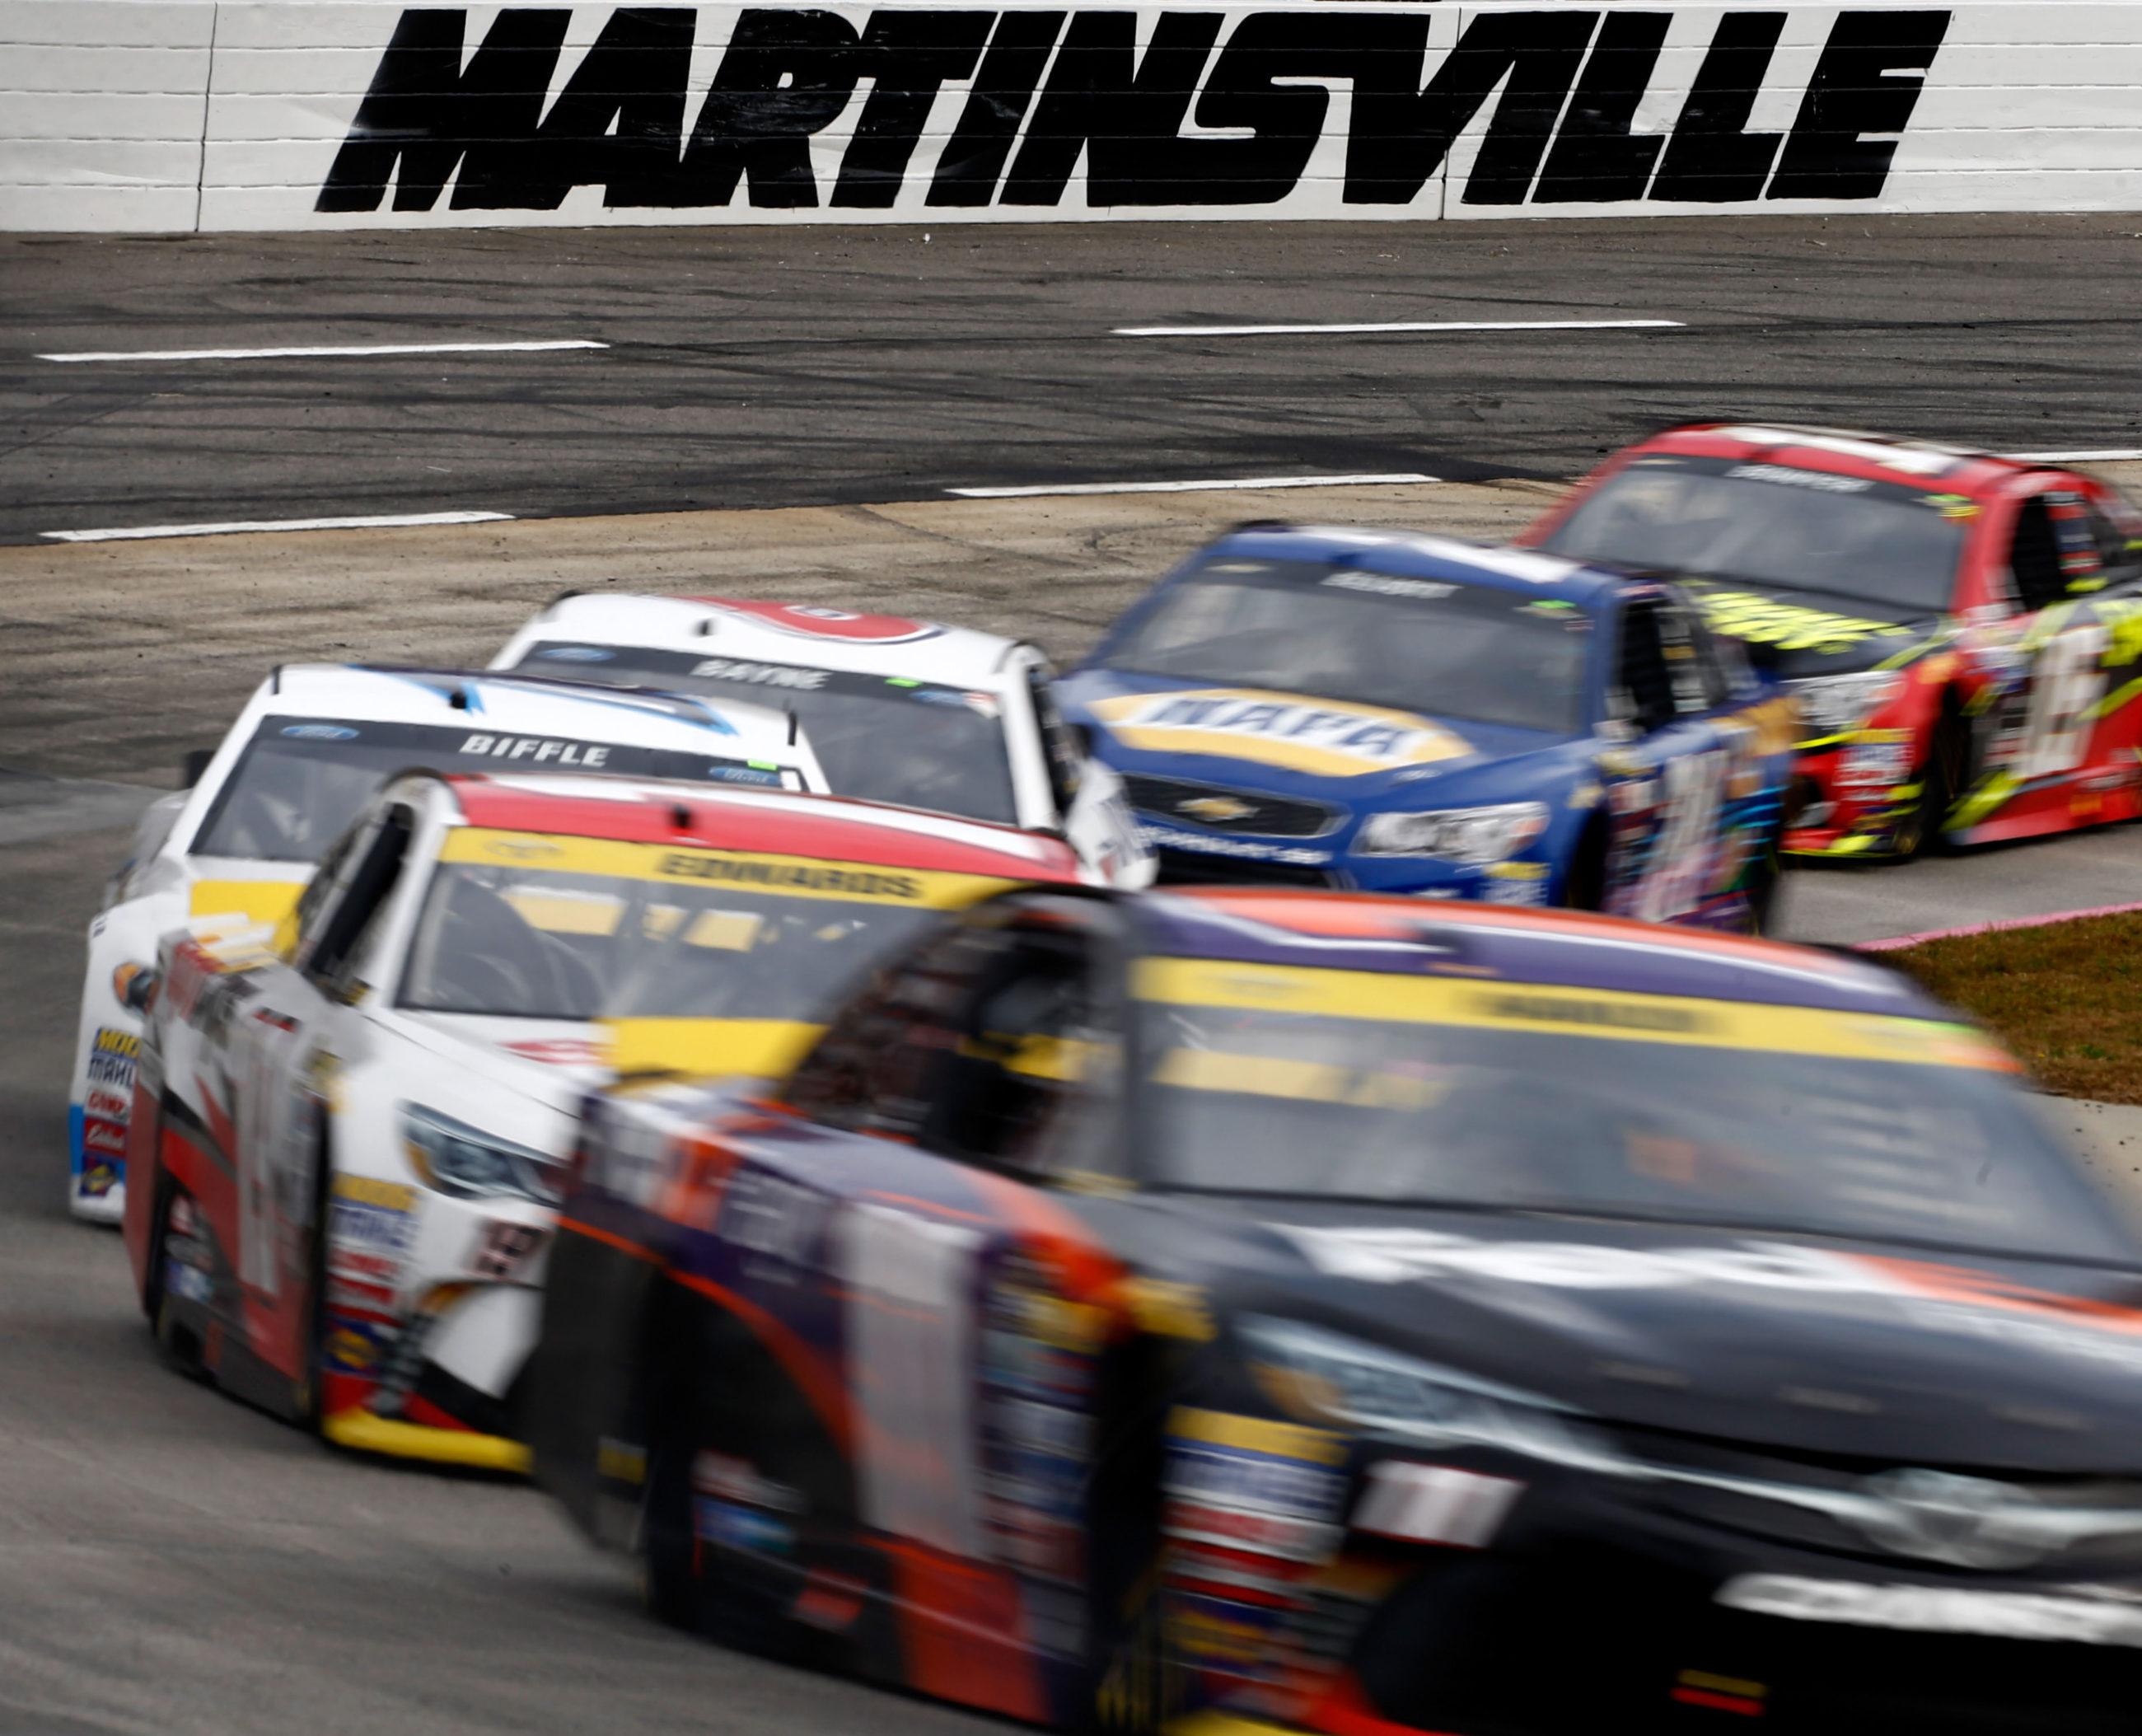 2016 Martinsville Speedway Results - Jeff Gordon's Final Race Results